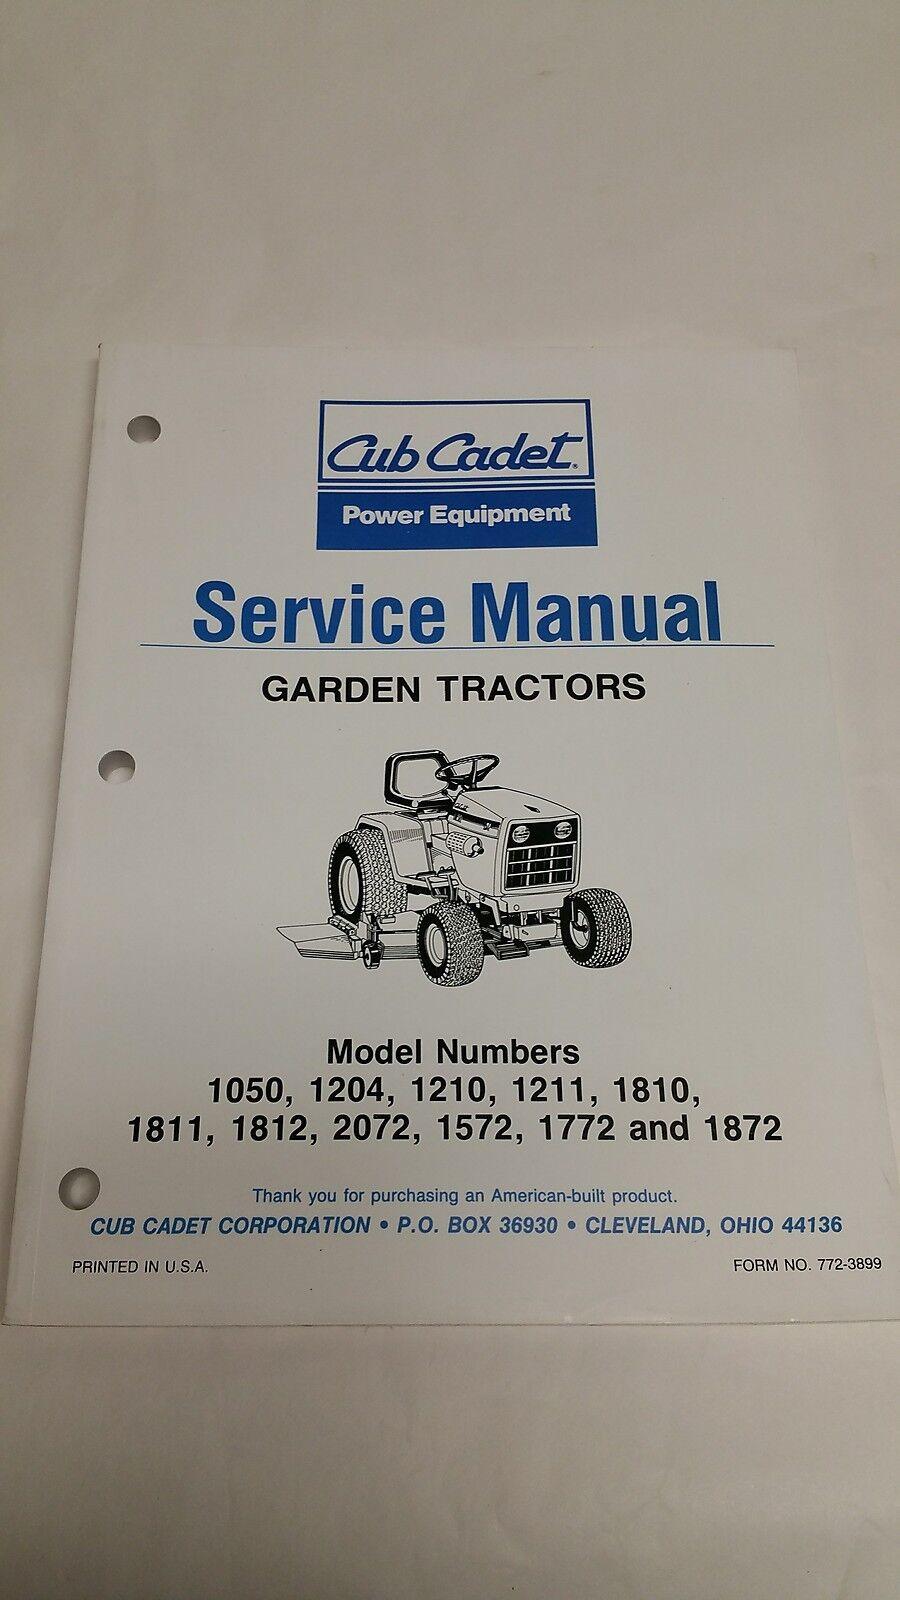 Cub Cadet 782 Manual Wiring Diagram Garden Tractor Service Ebay 900x1600